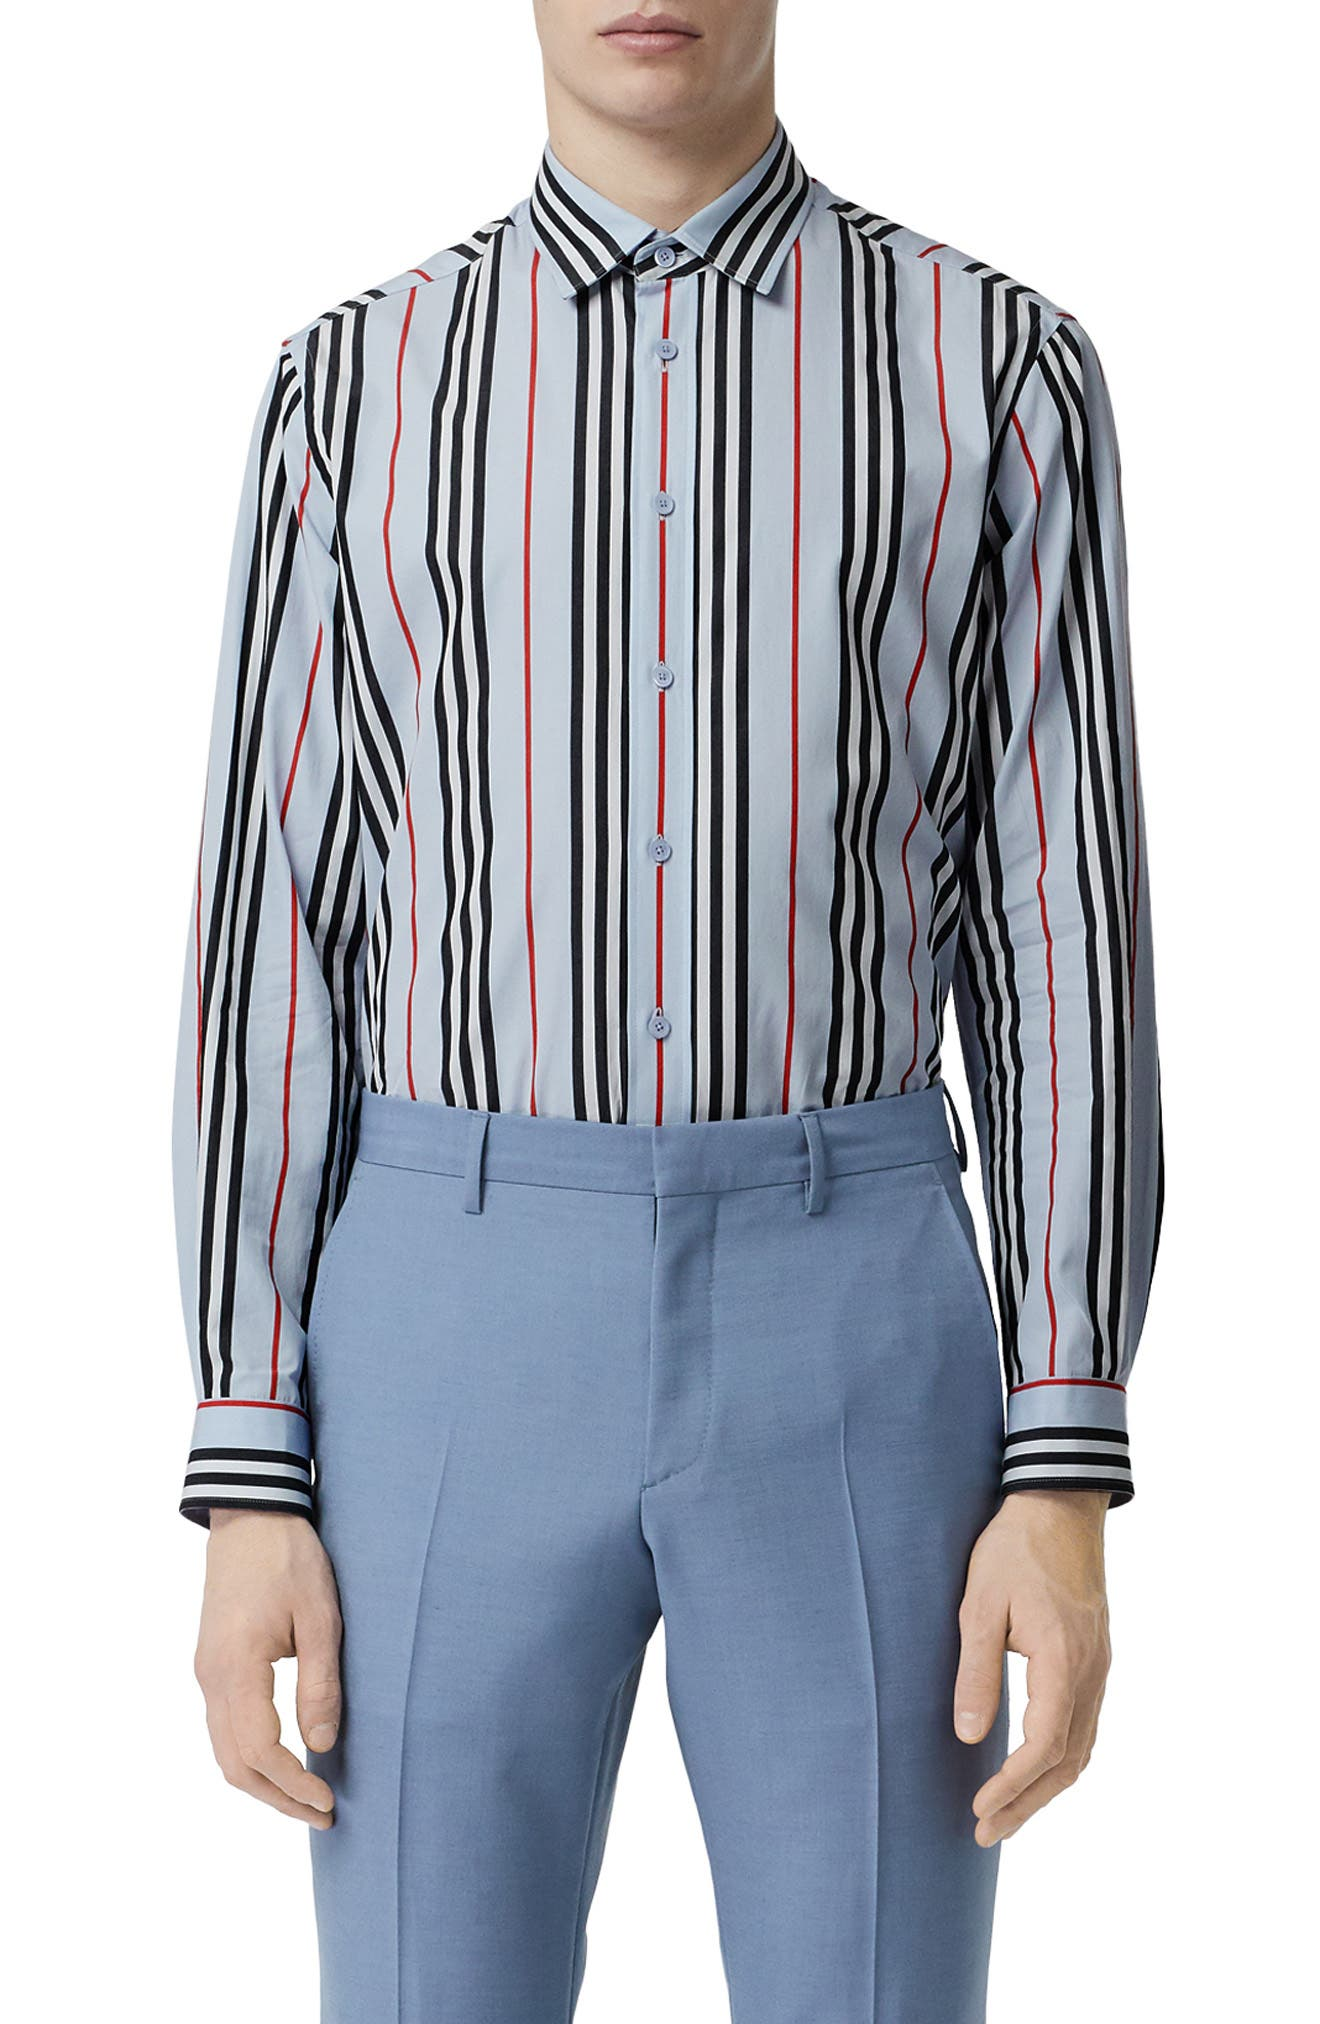 BURBERRY, Icon Stripe Shirt, Main thumbnail 1, color, PALE BLUE